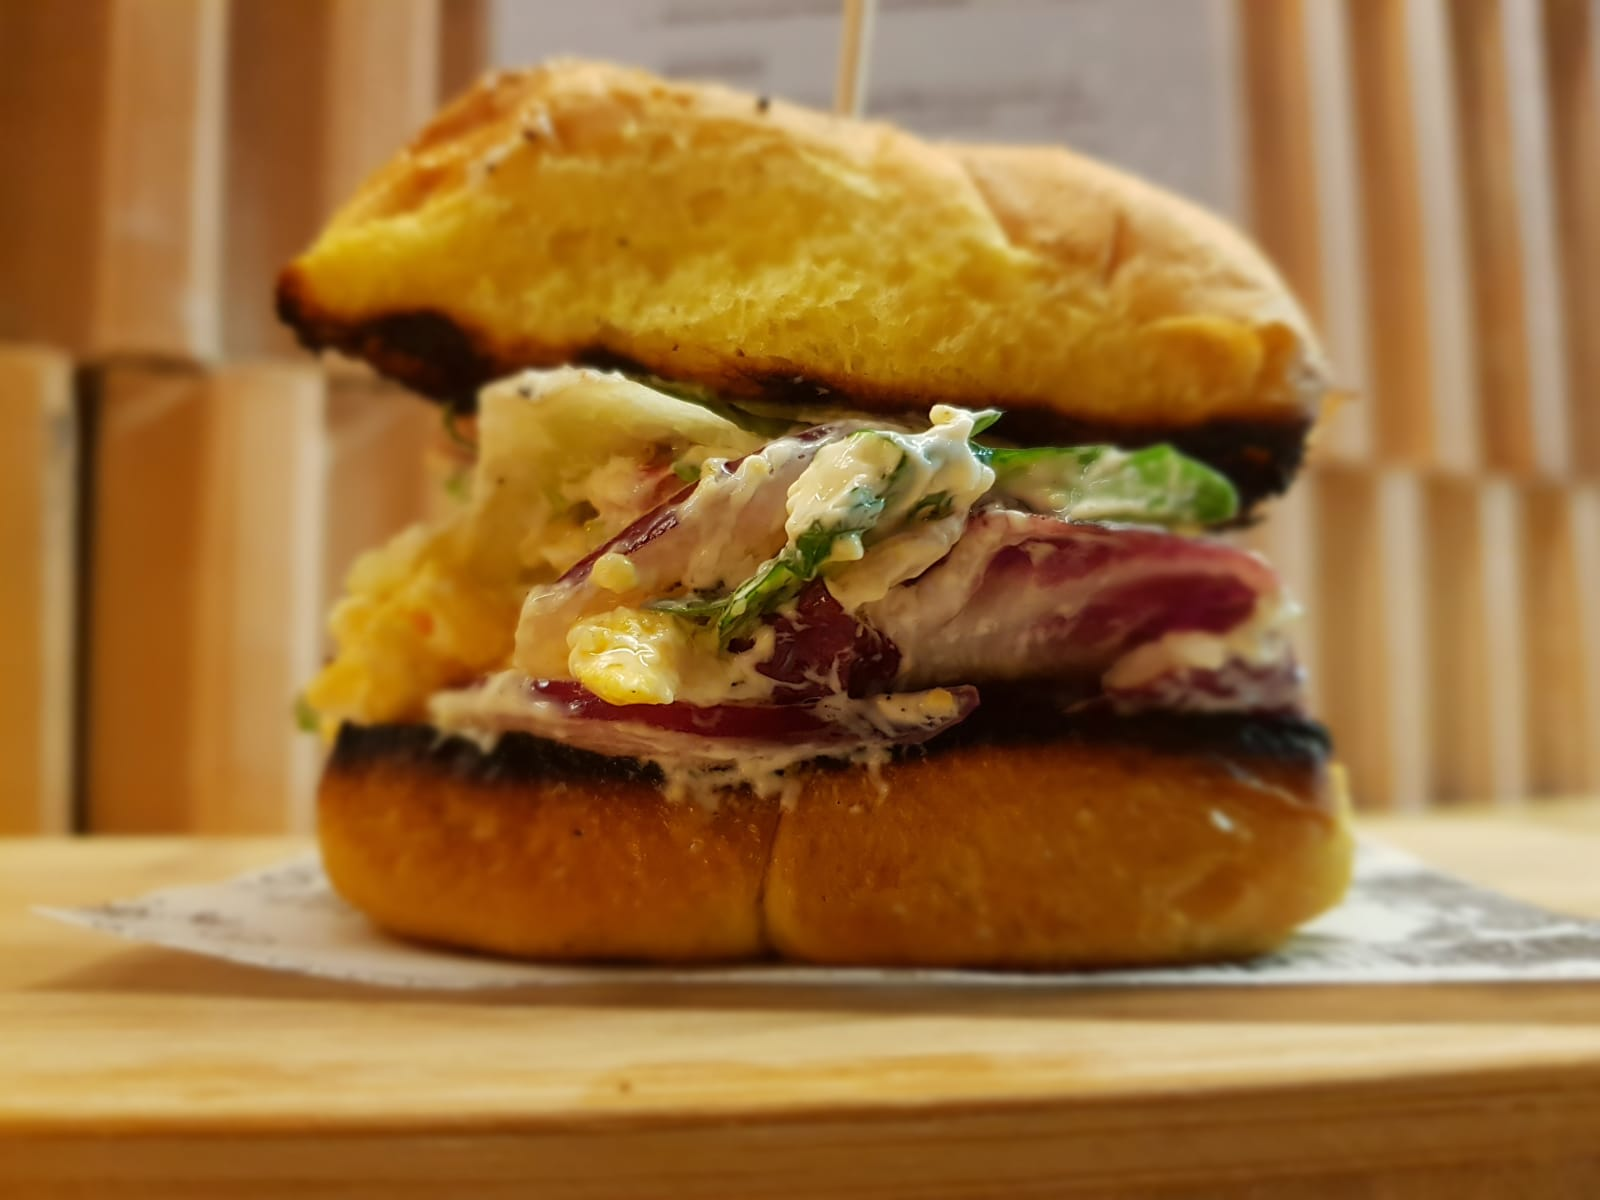 desayuno brunch zaragoza mini sandwich vegetal